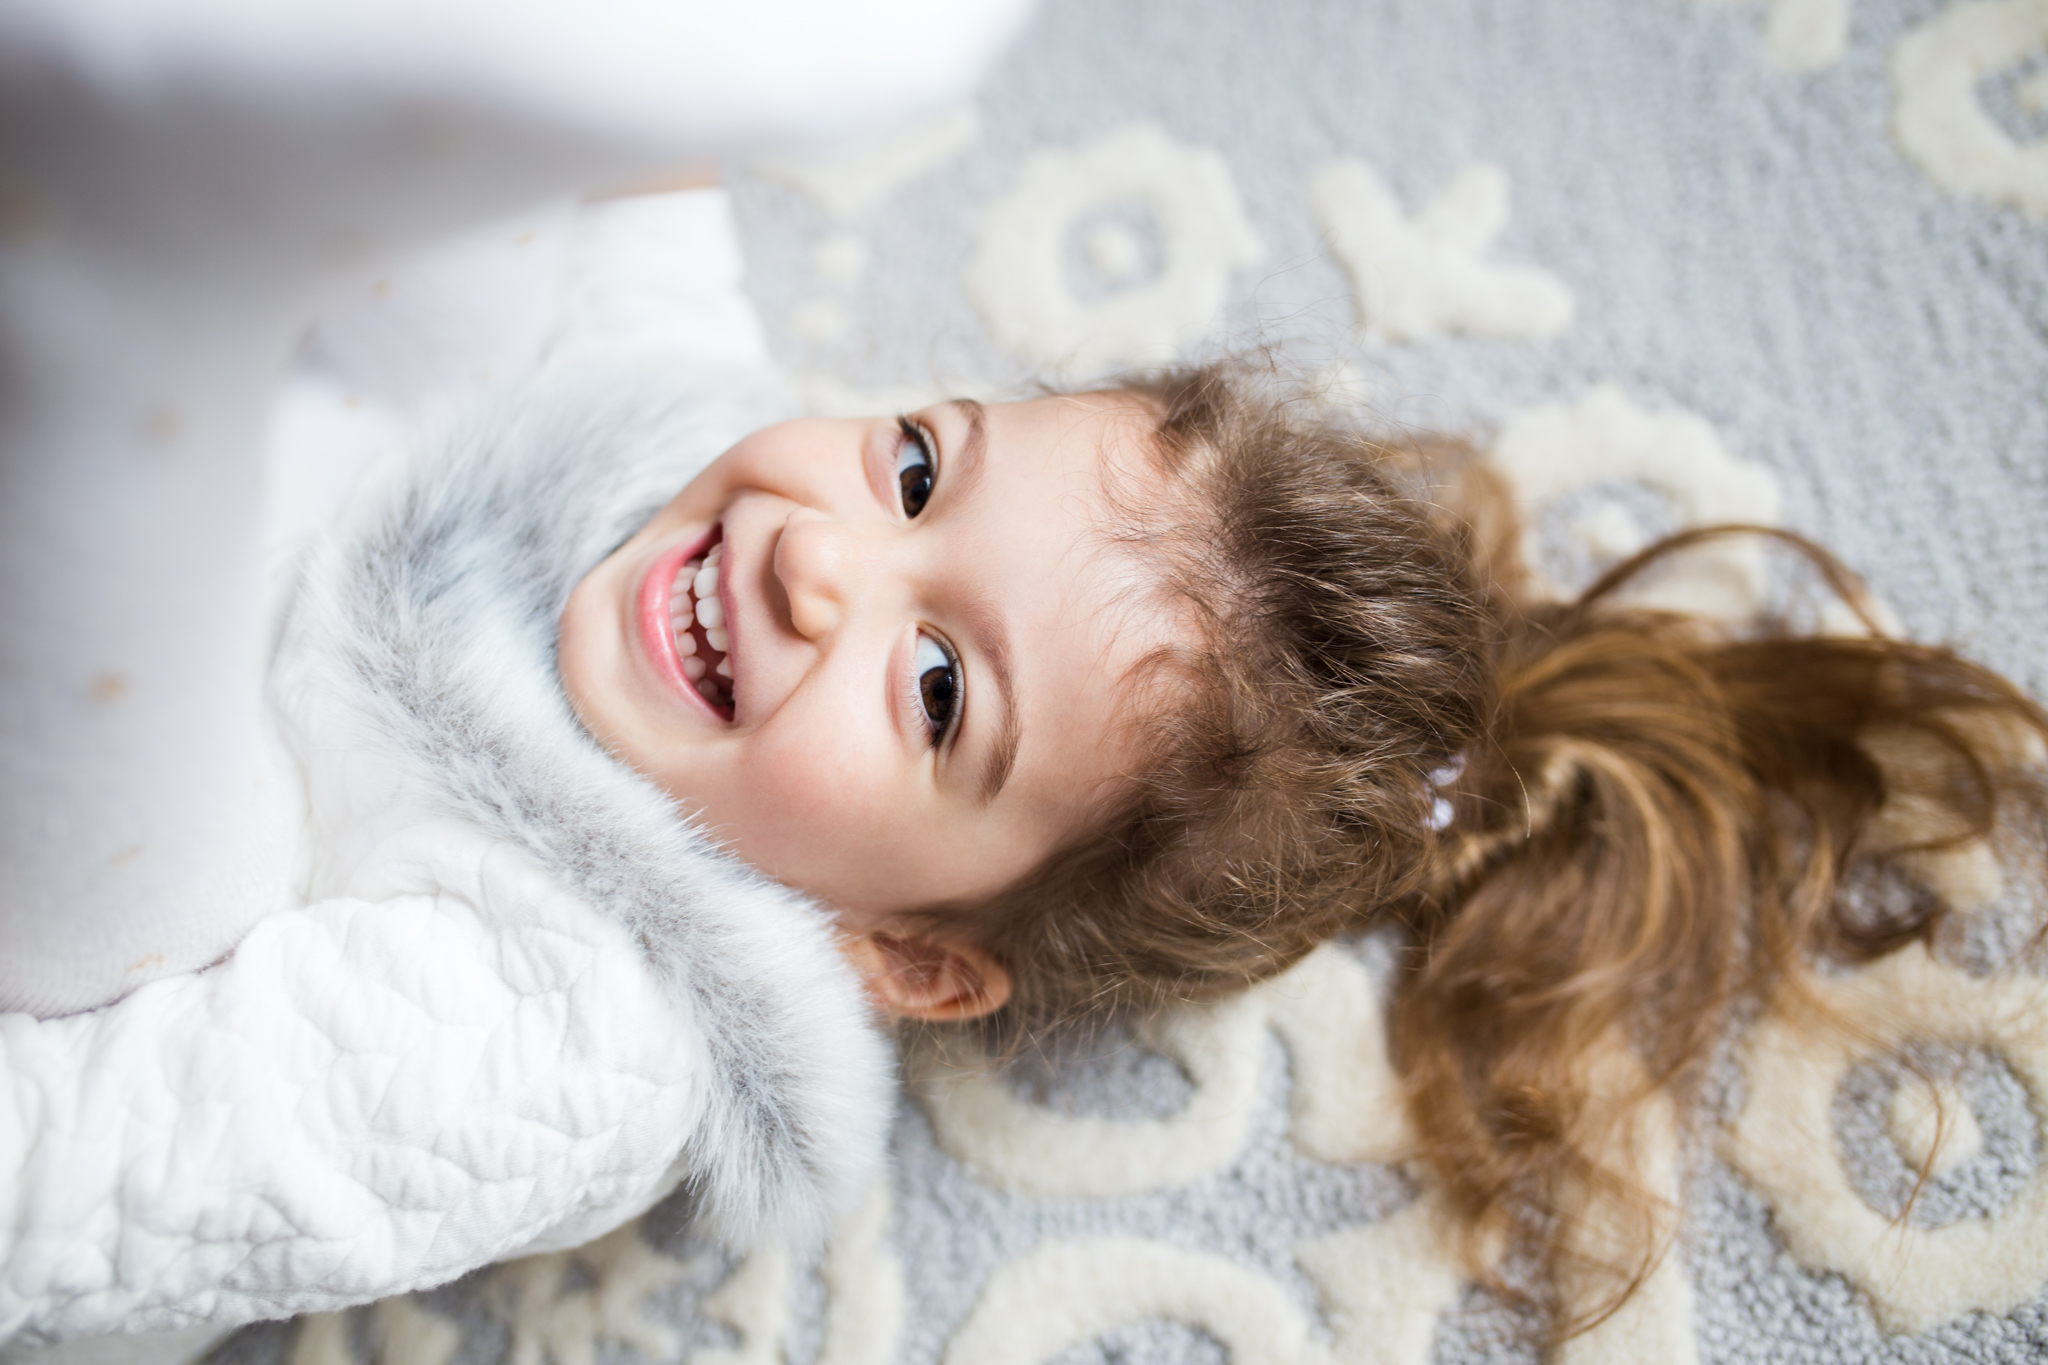 seattle-newborn-photographer-baby-f-01.jpg